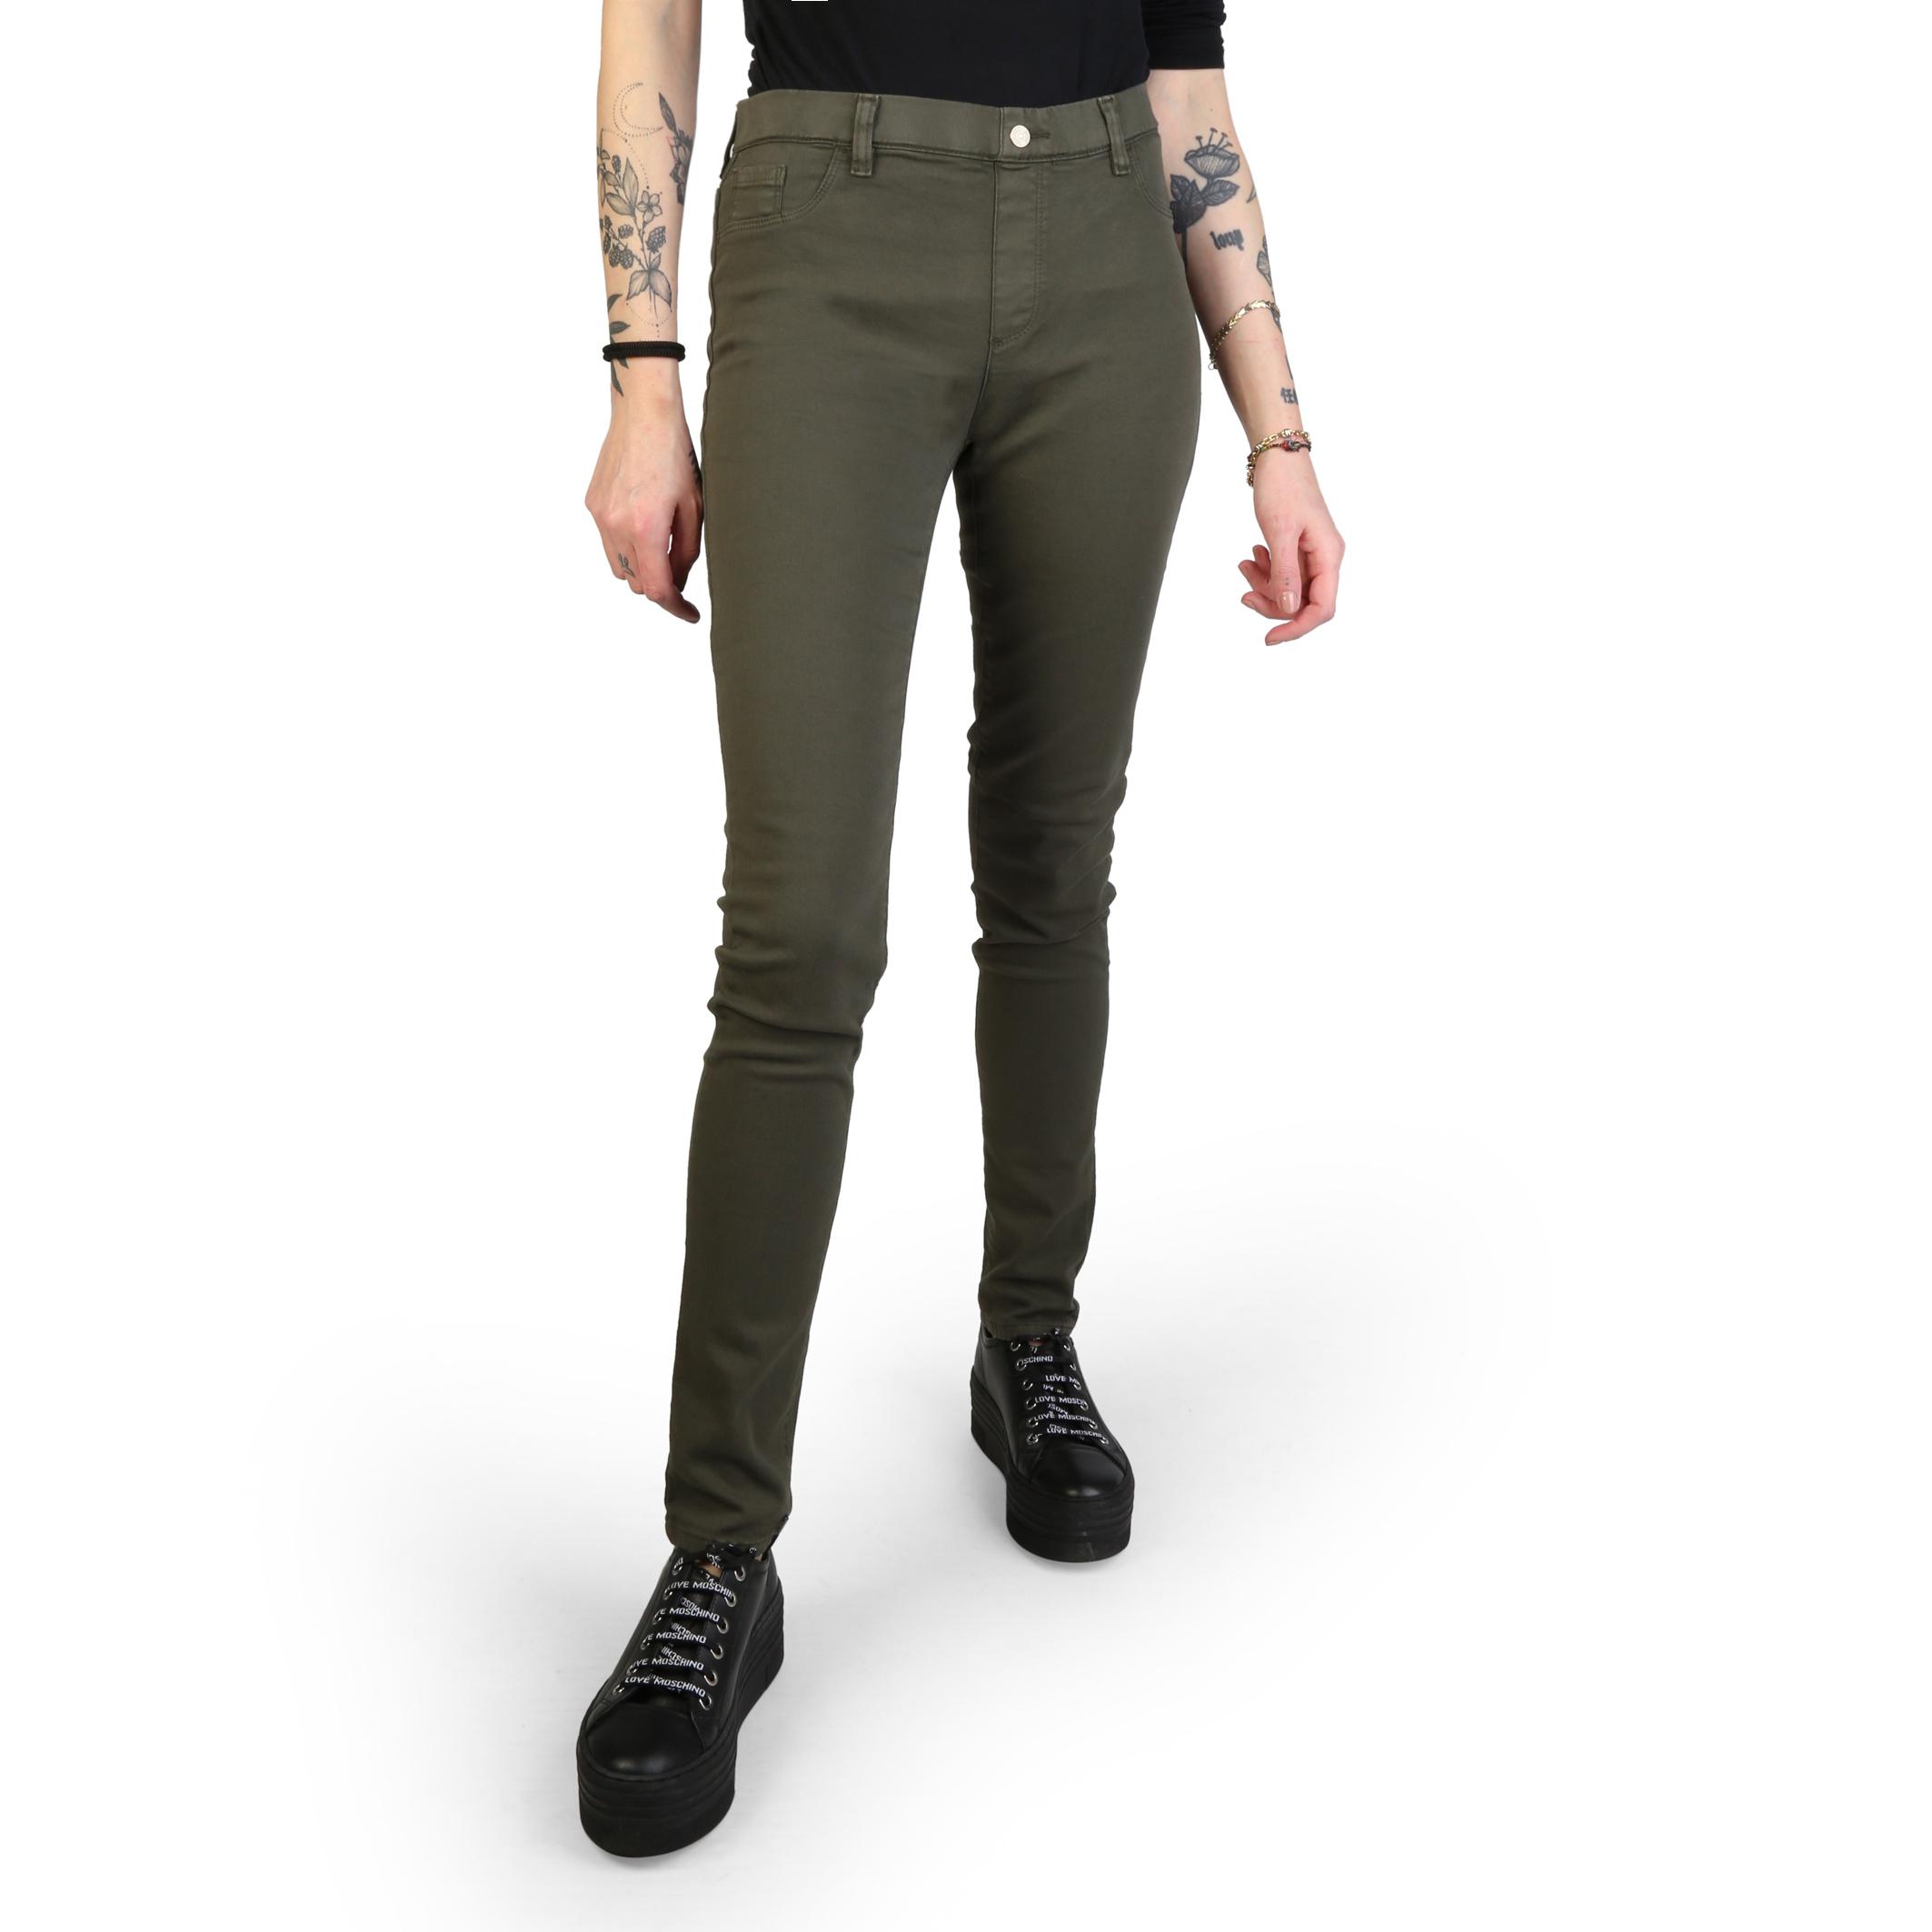 Carrera Jeans 00767L_922SS Women Green 98151 denim jeans